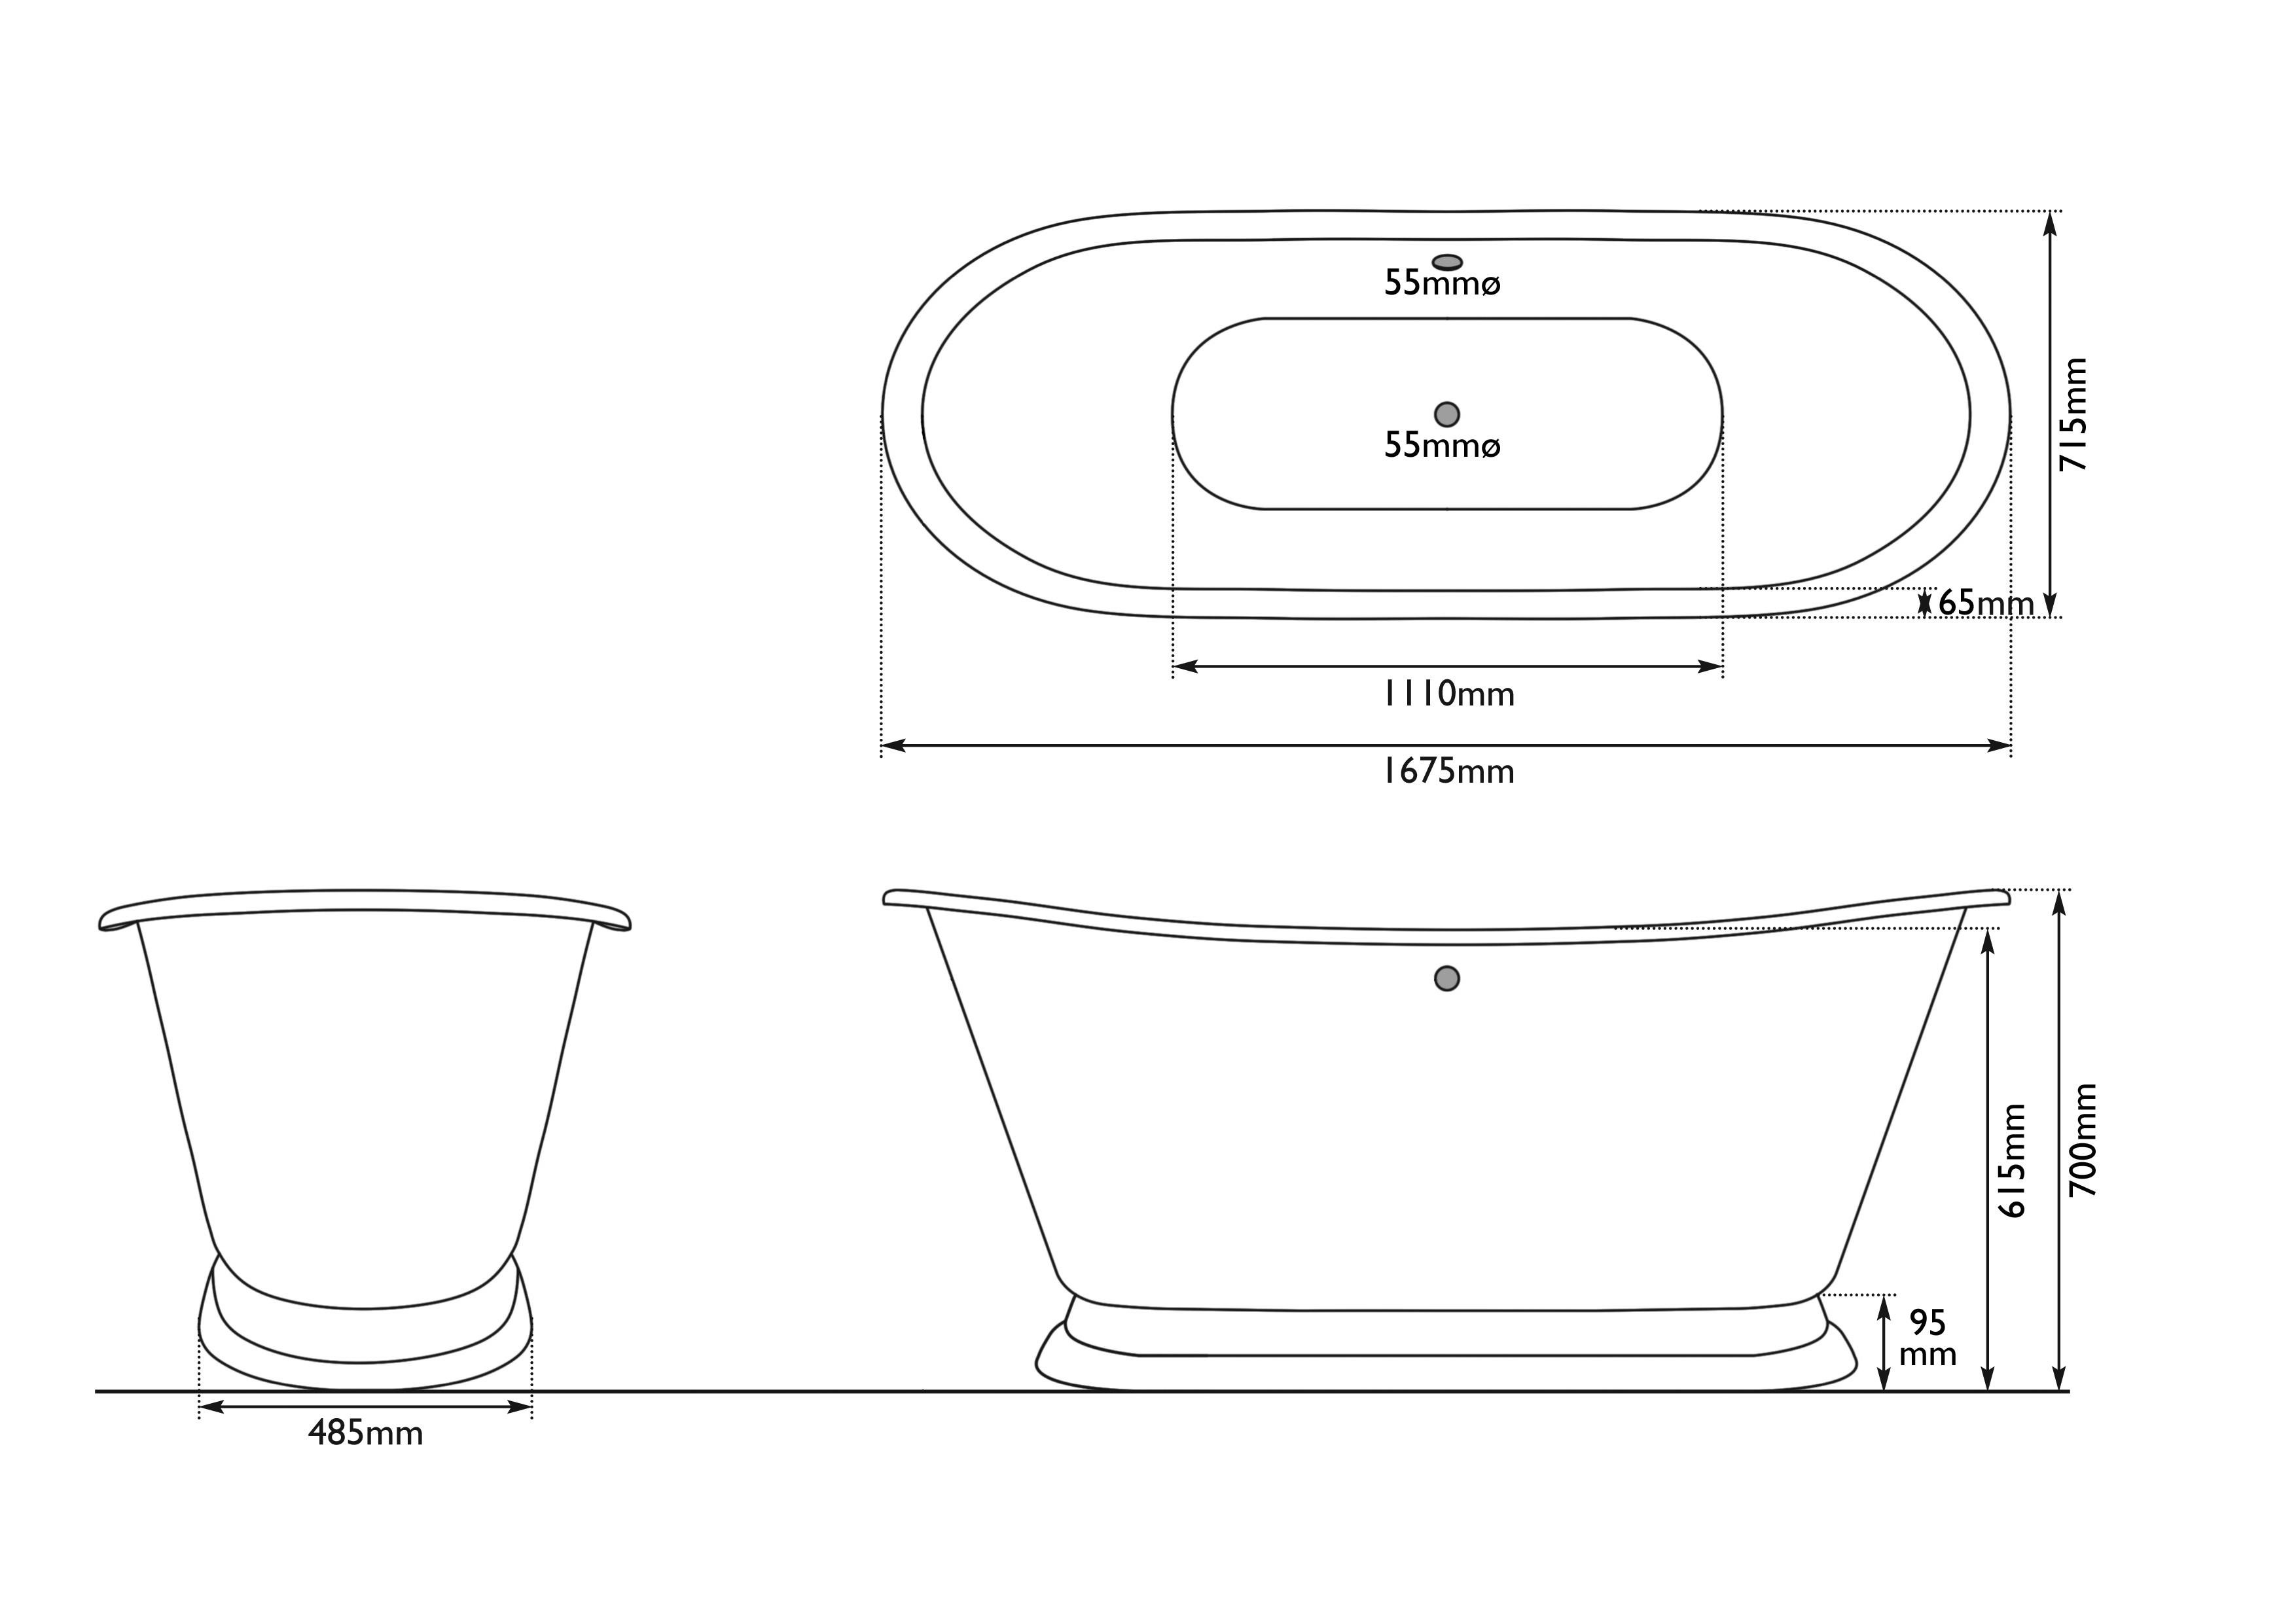 Dimensions Of Hurlingham Galleon Cast Iron Bath